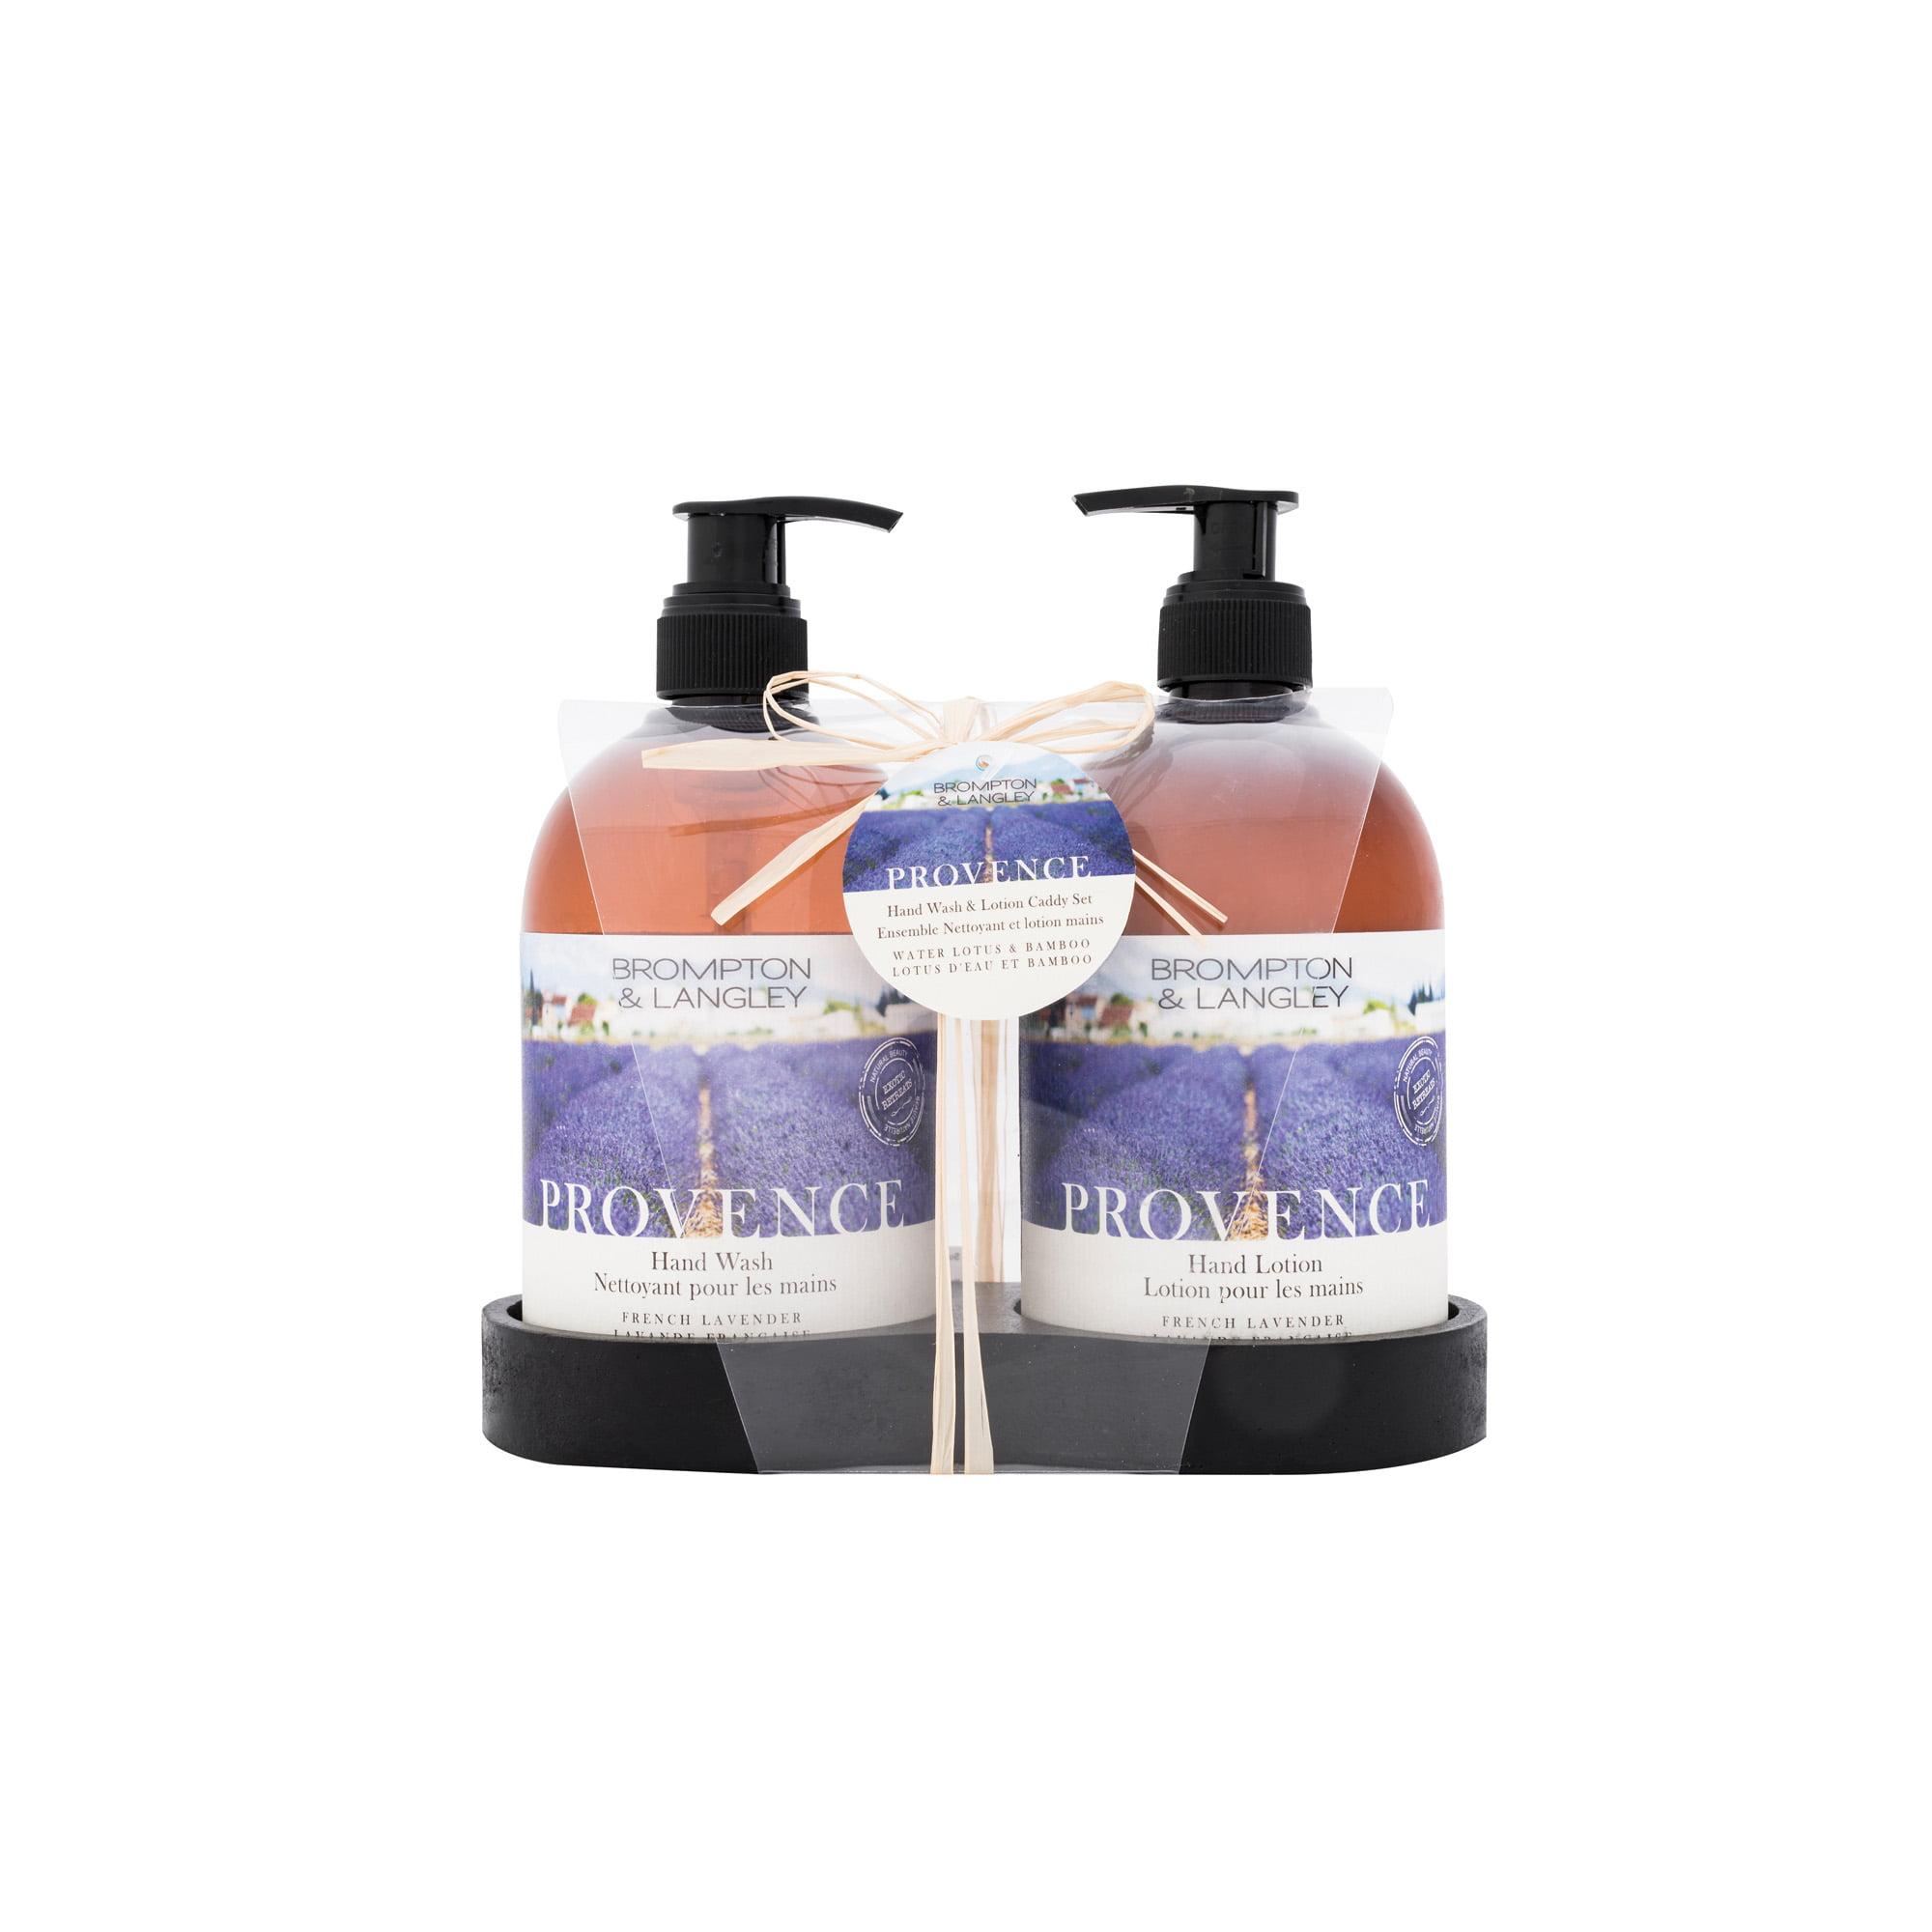 Brompton Langley Hand Cream Gift Set Lavender Vanilla Almond Milk Honeyle 3 Ct Com